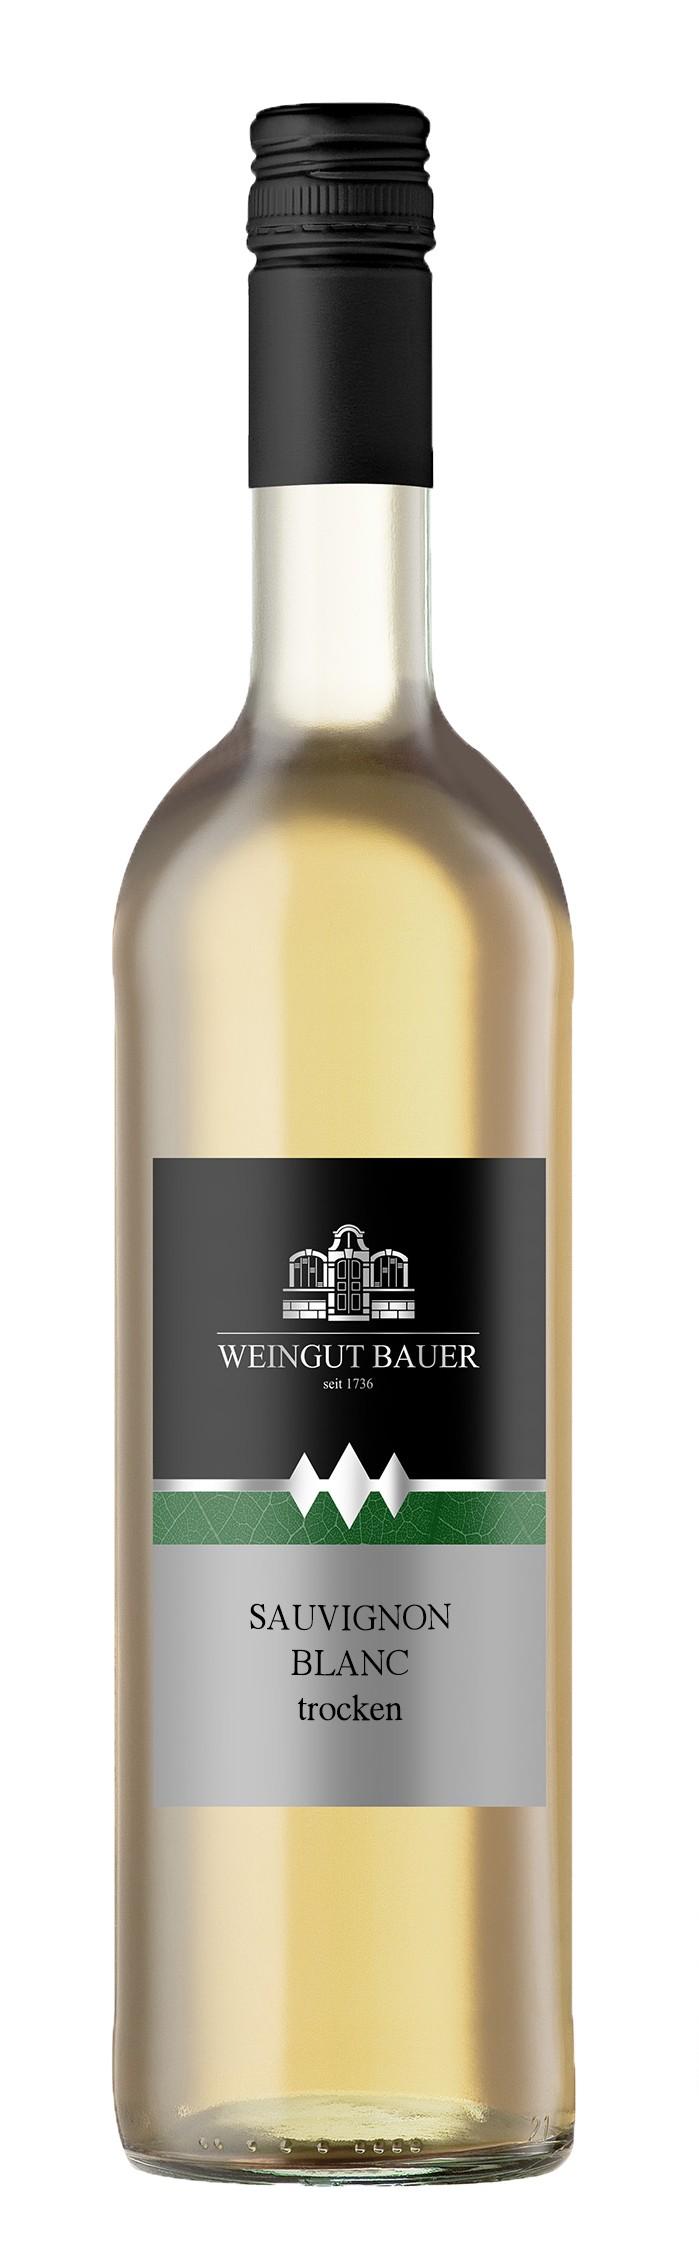 2018 Sauvignon blanc trocken 750ml